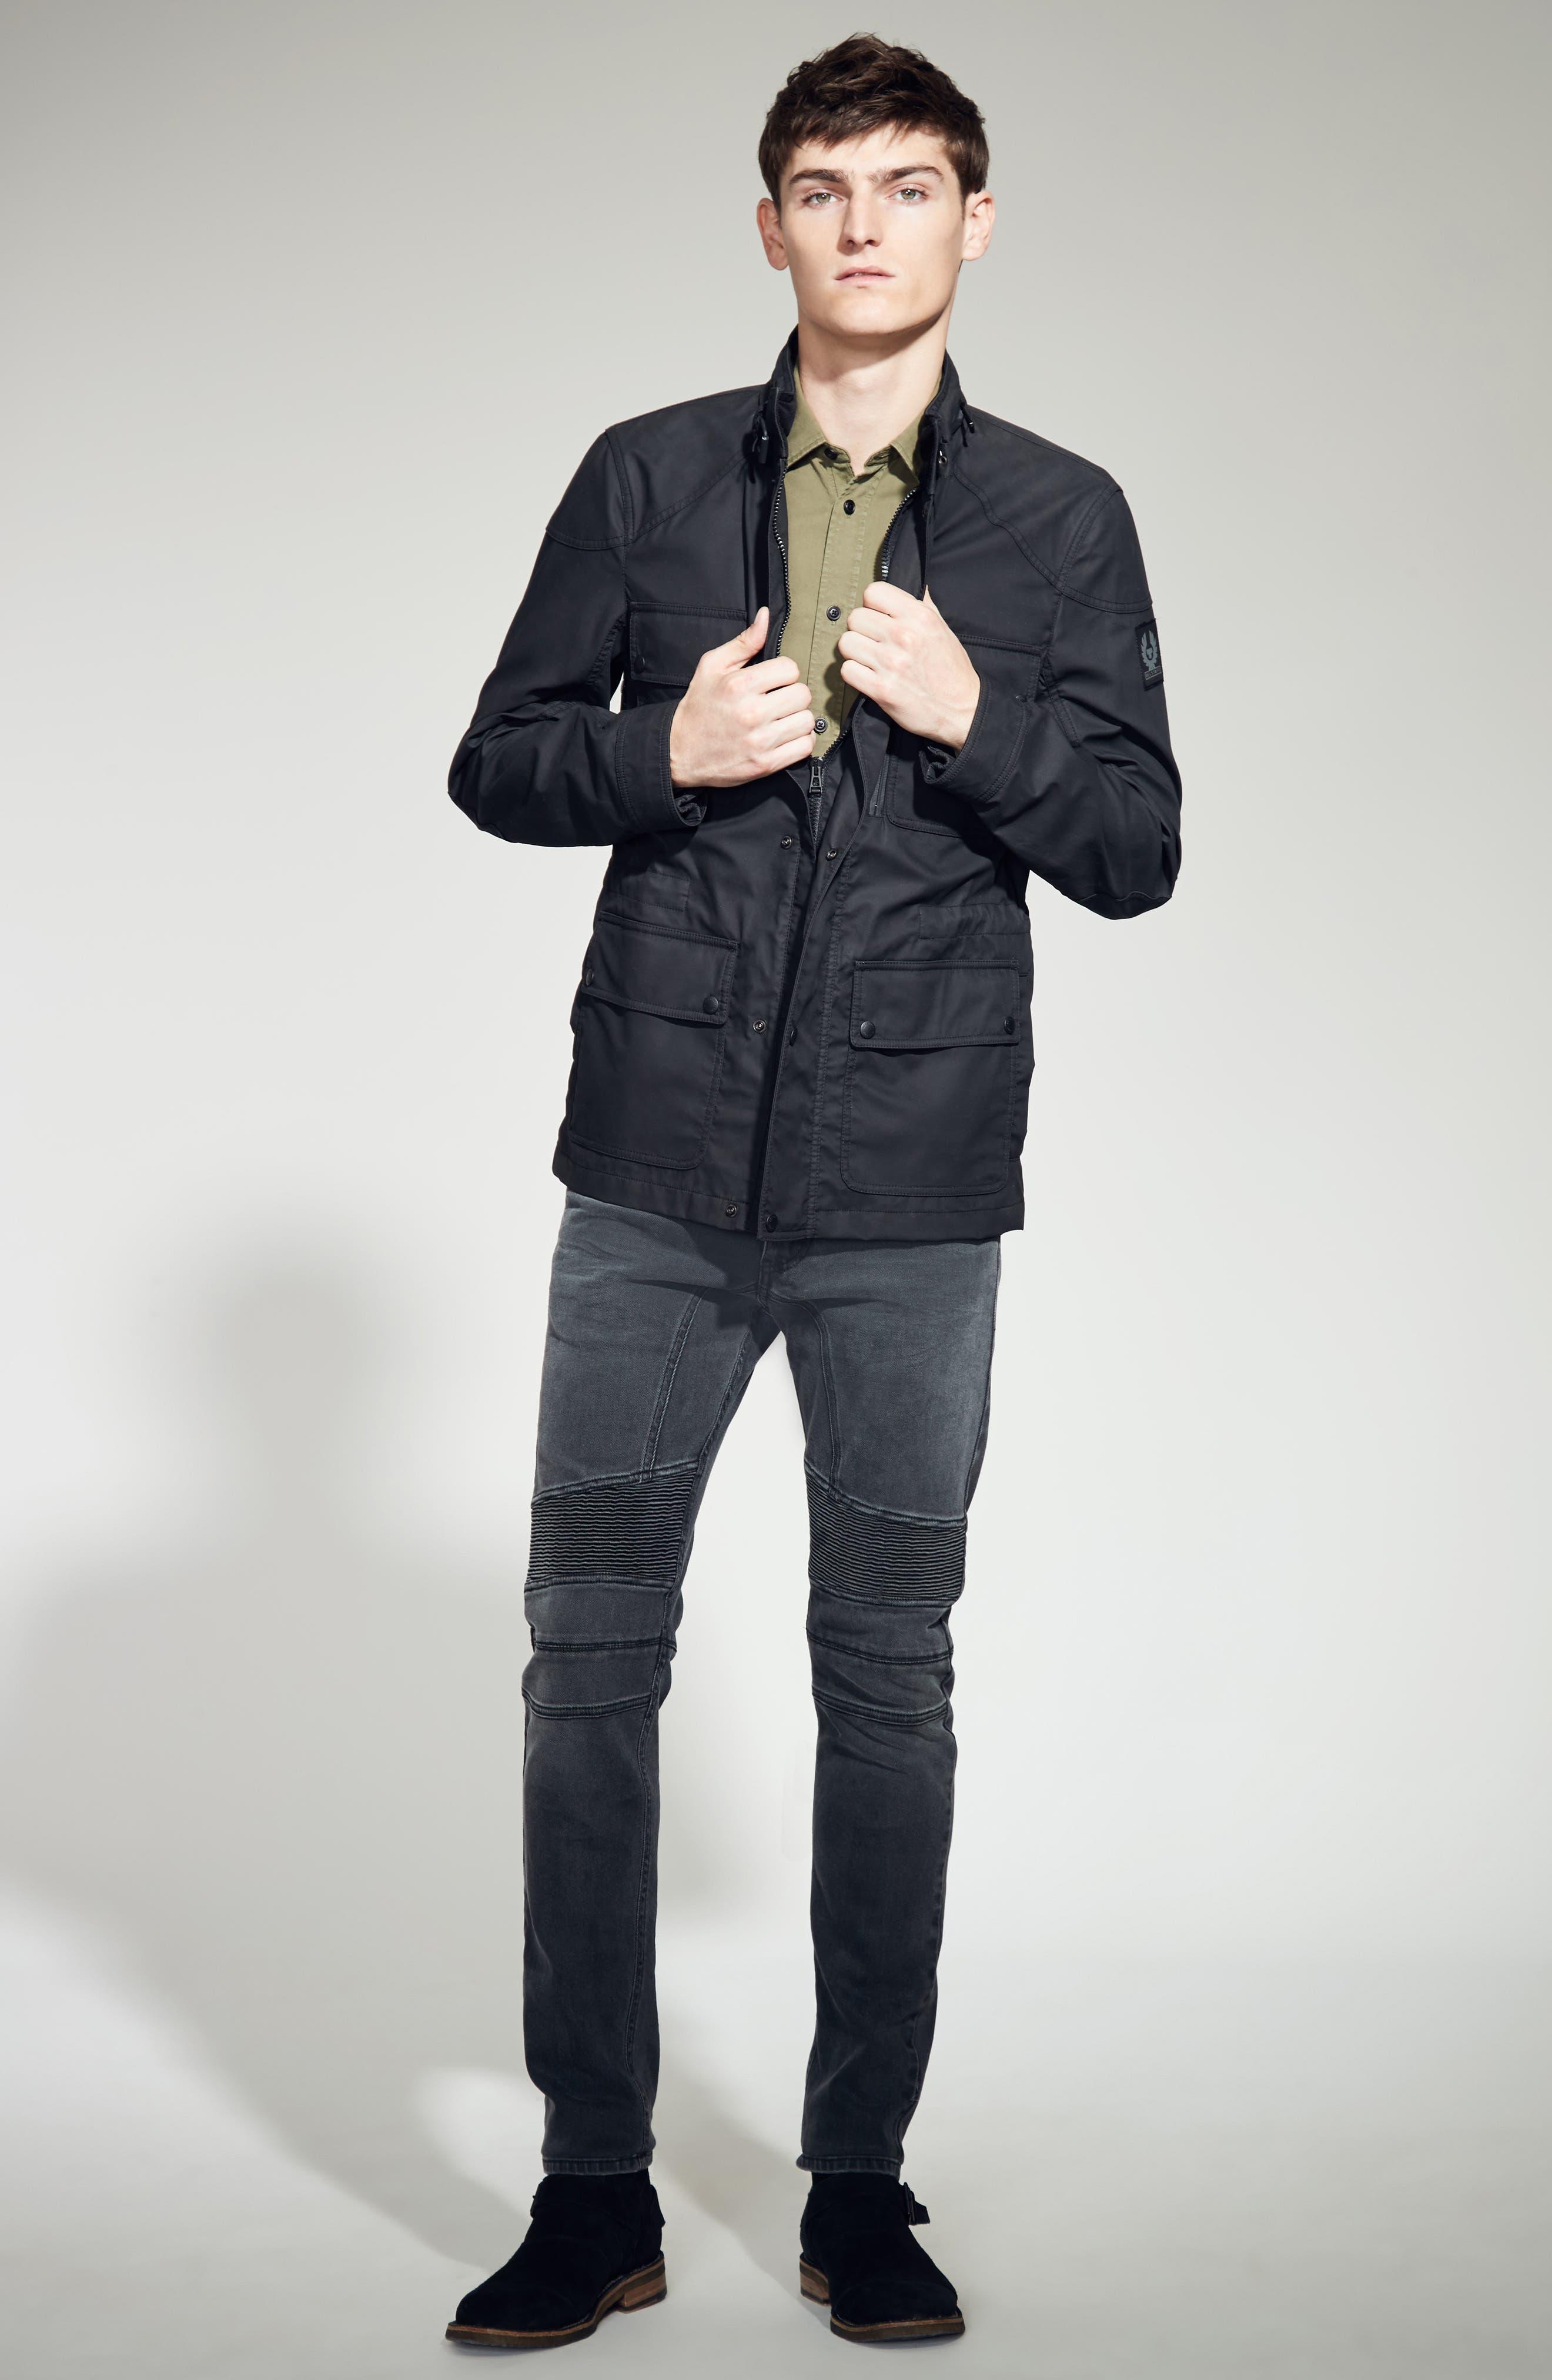 Eastham Slim Fit Stretch Denim Moto Jeans,                             Alternate thumbnail 2, color,                             022